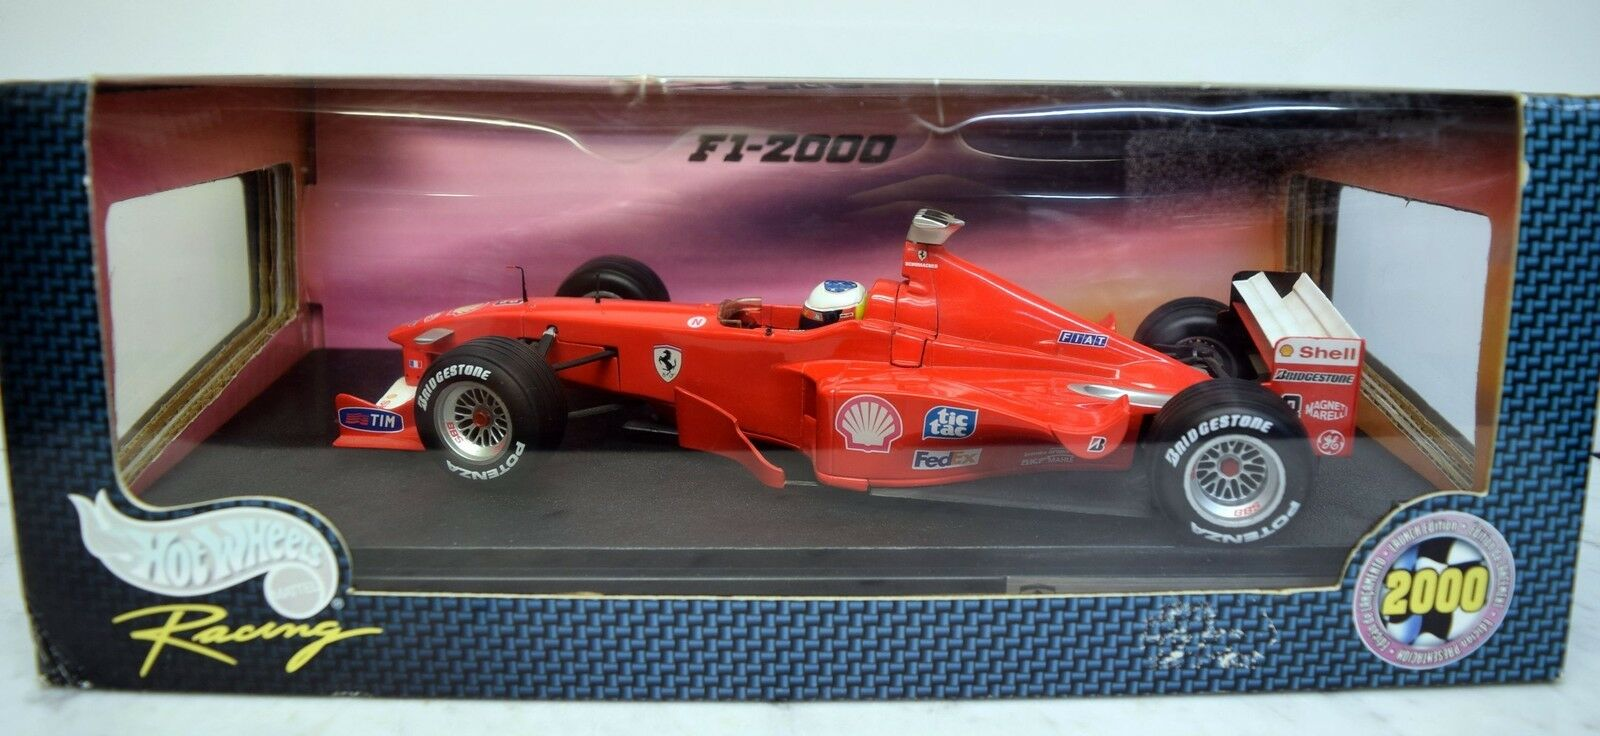 Hot Wheels 1 18 18 18 26697 ferrari f1 2000, m. schumacher a1b12c